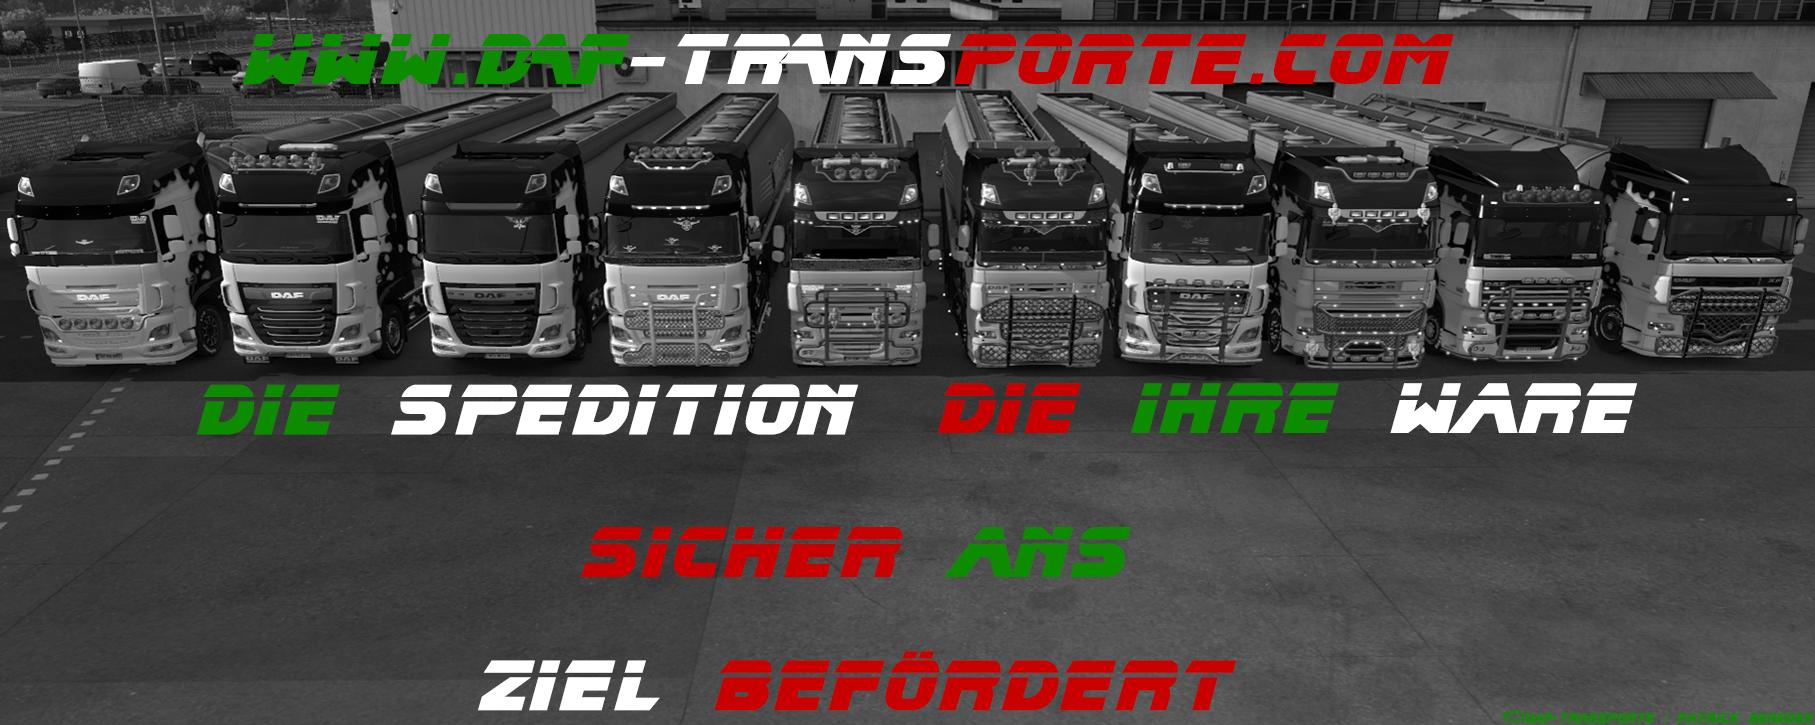 DAF - Transporte